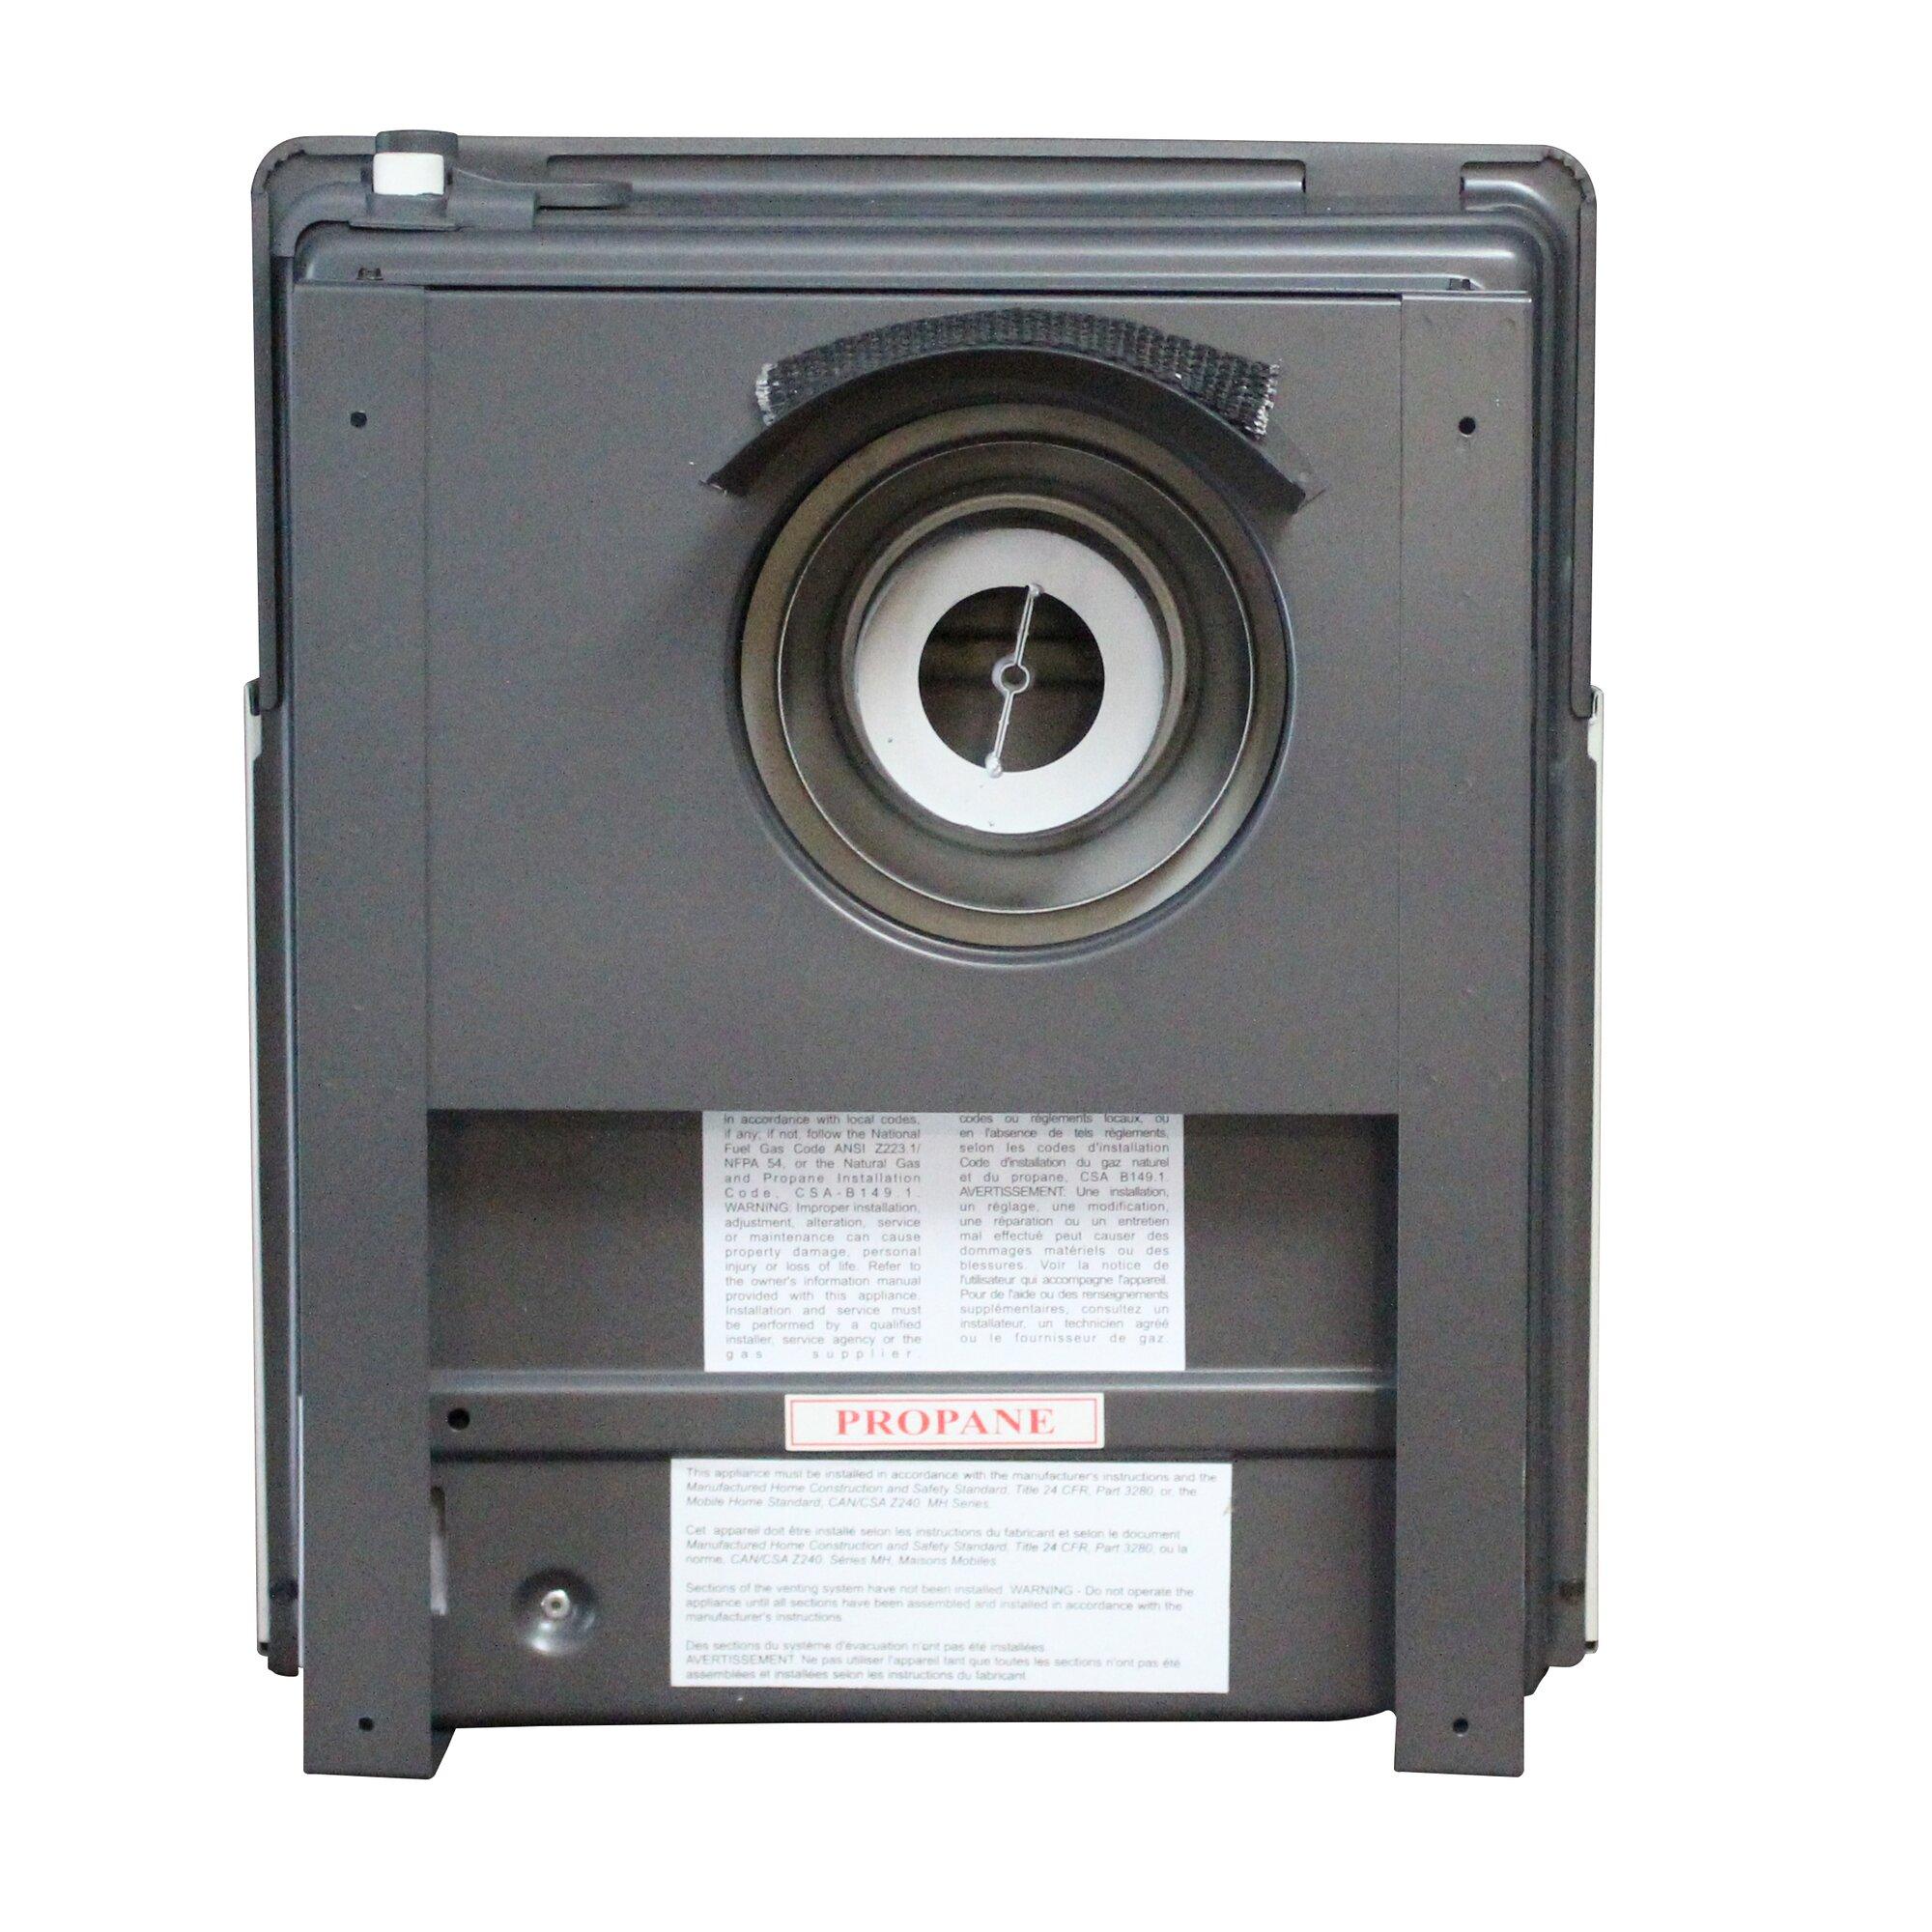 Ashley Hearth 11000 Btu Natural Gas Direct Vent Heater Reviews .  Direct Vent Gas Fireplace Reviews